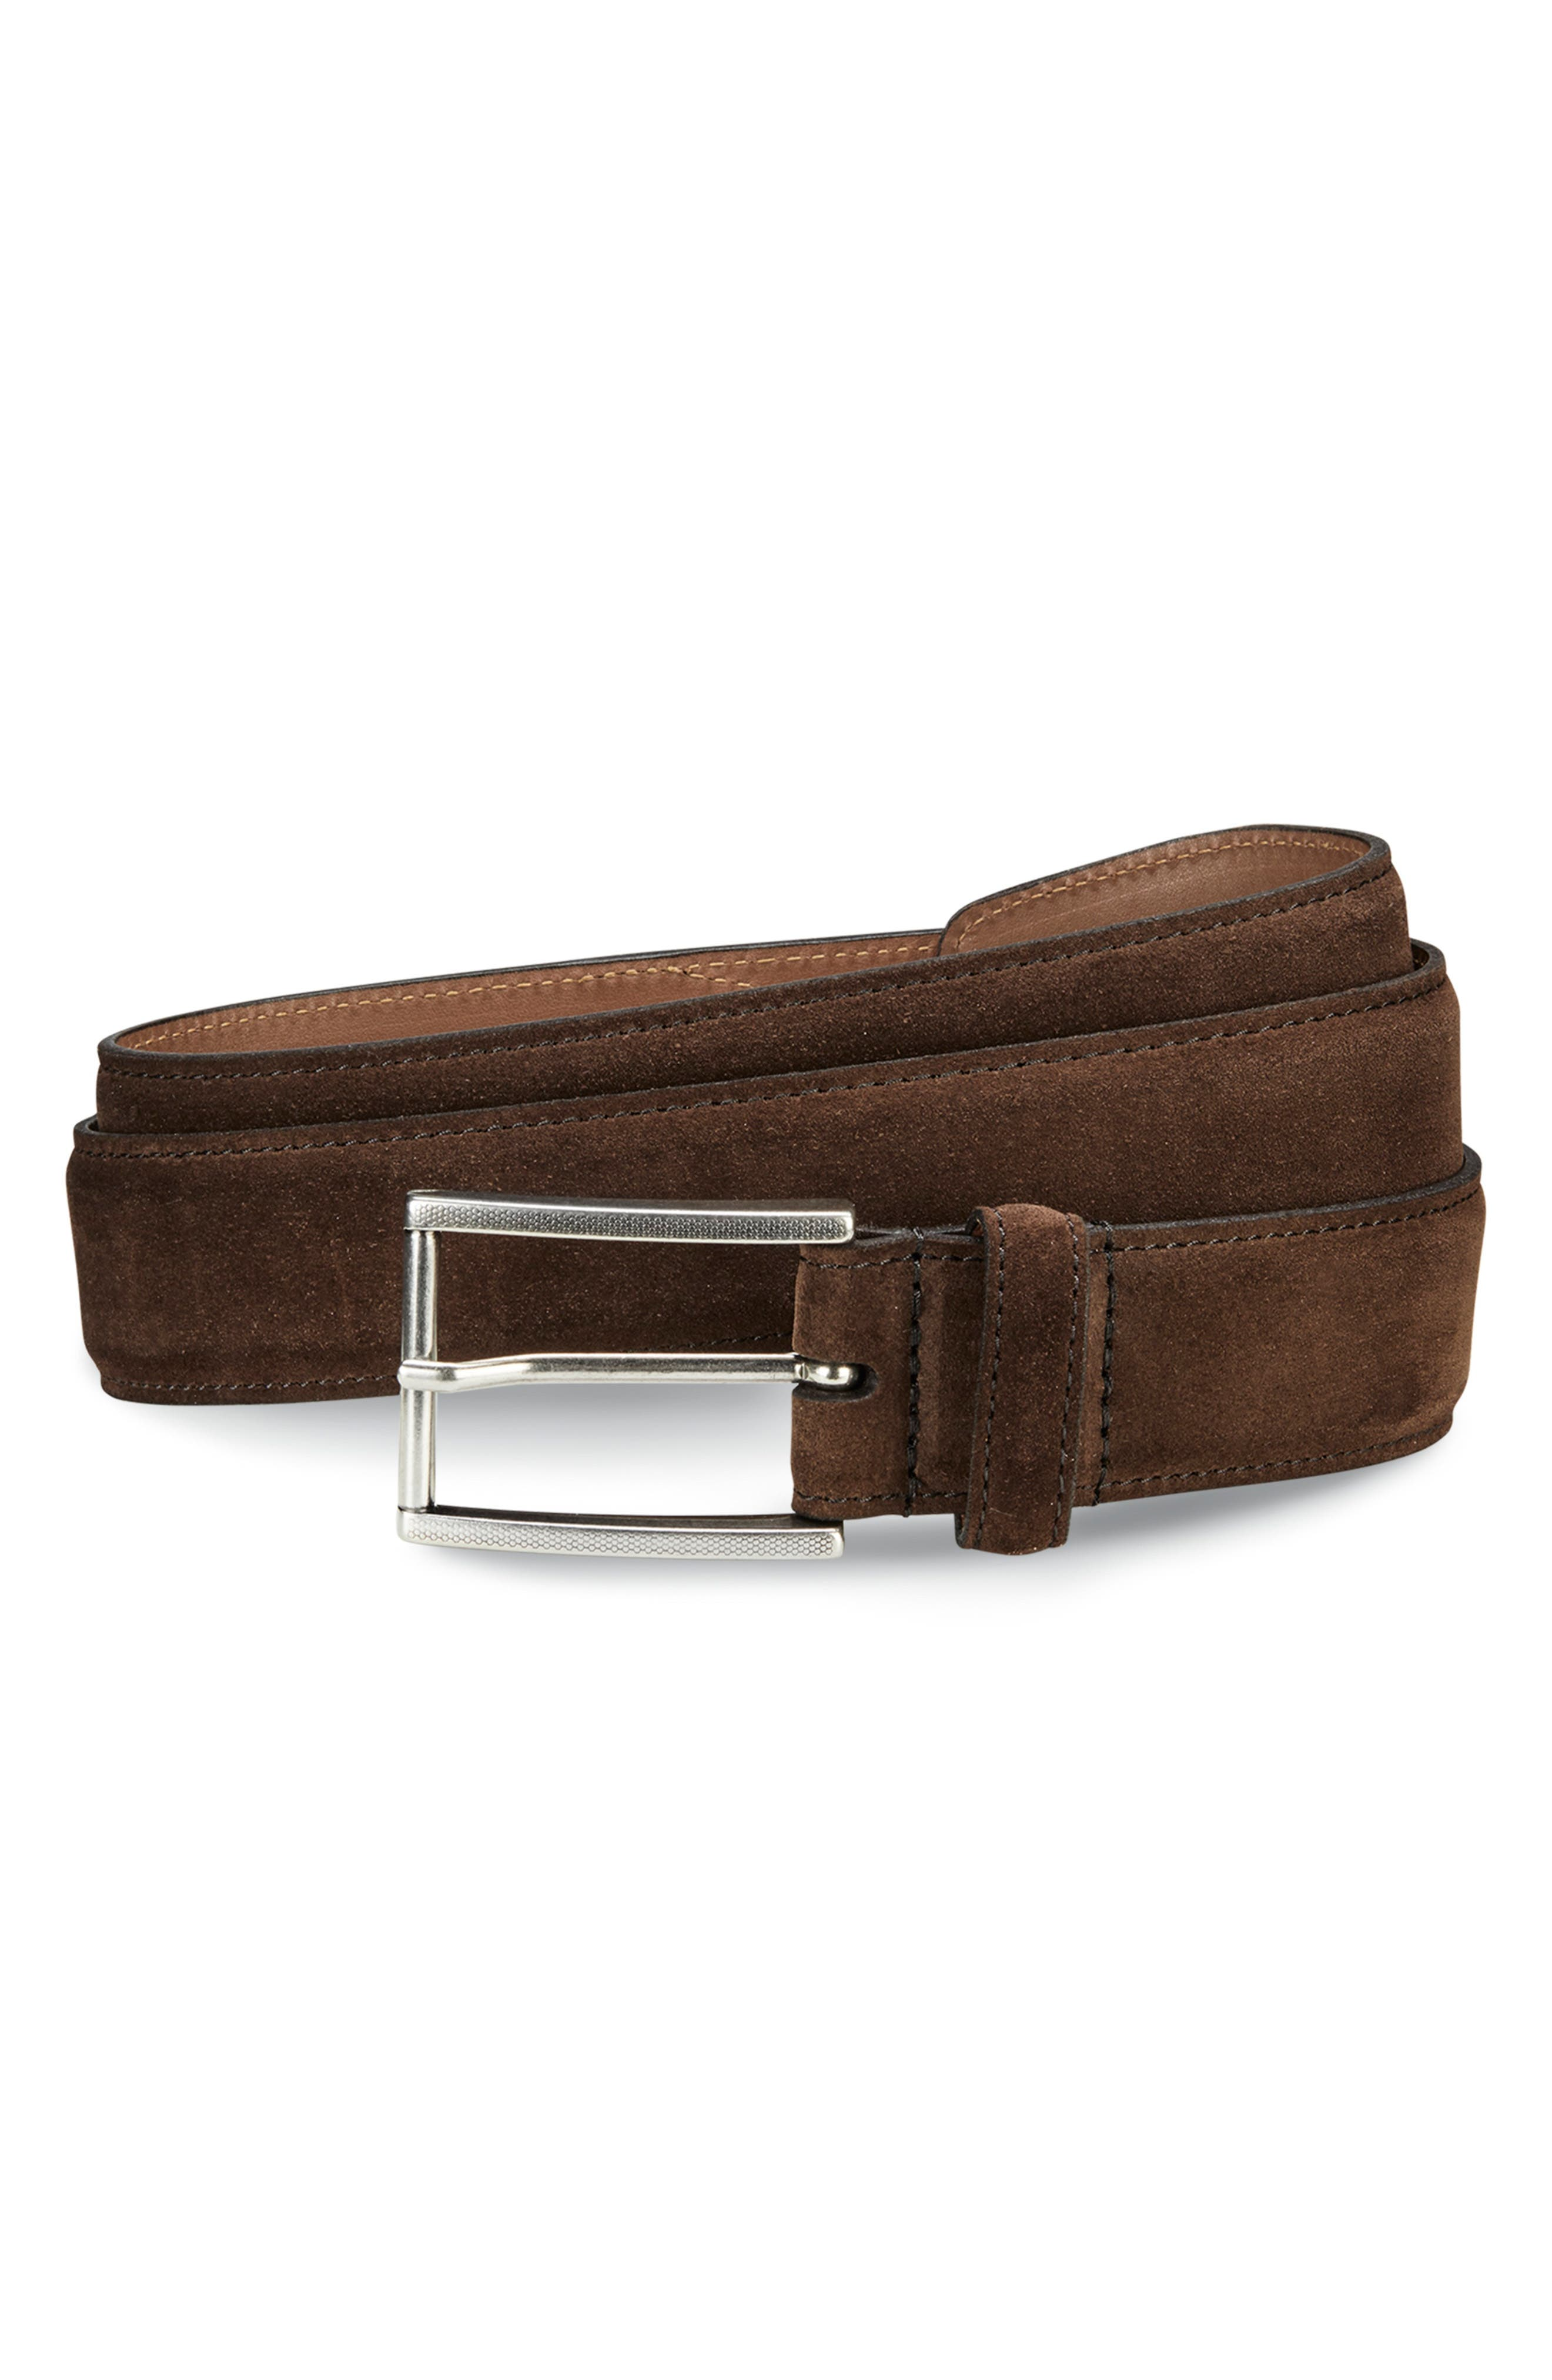 Suede Avenue Leather Belt